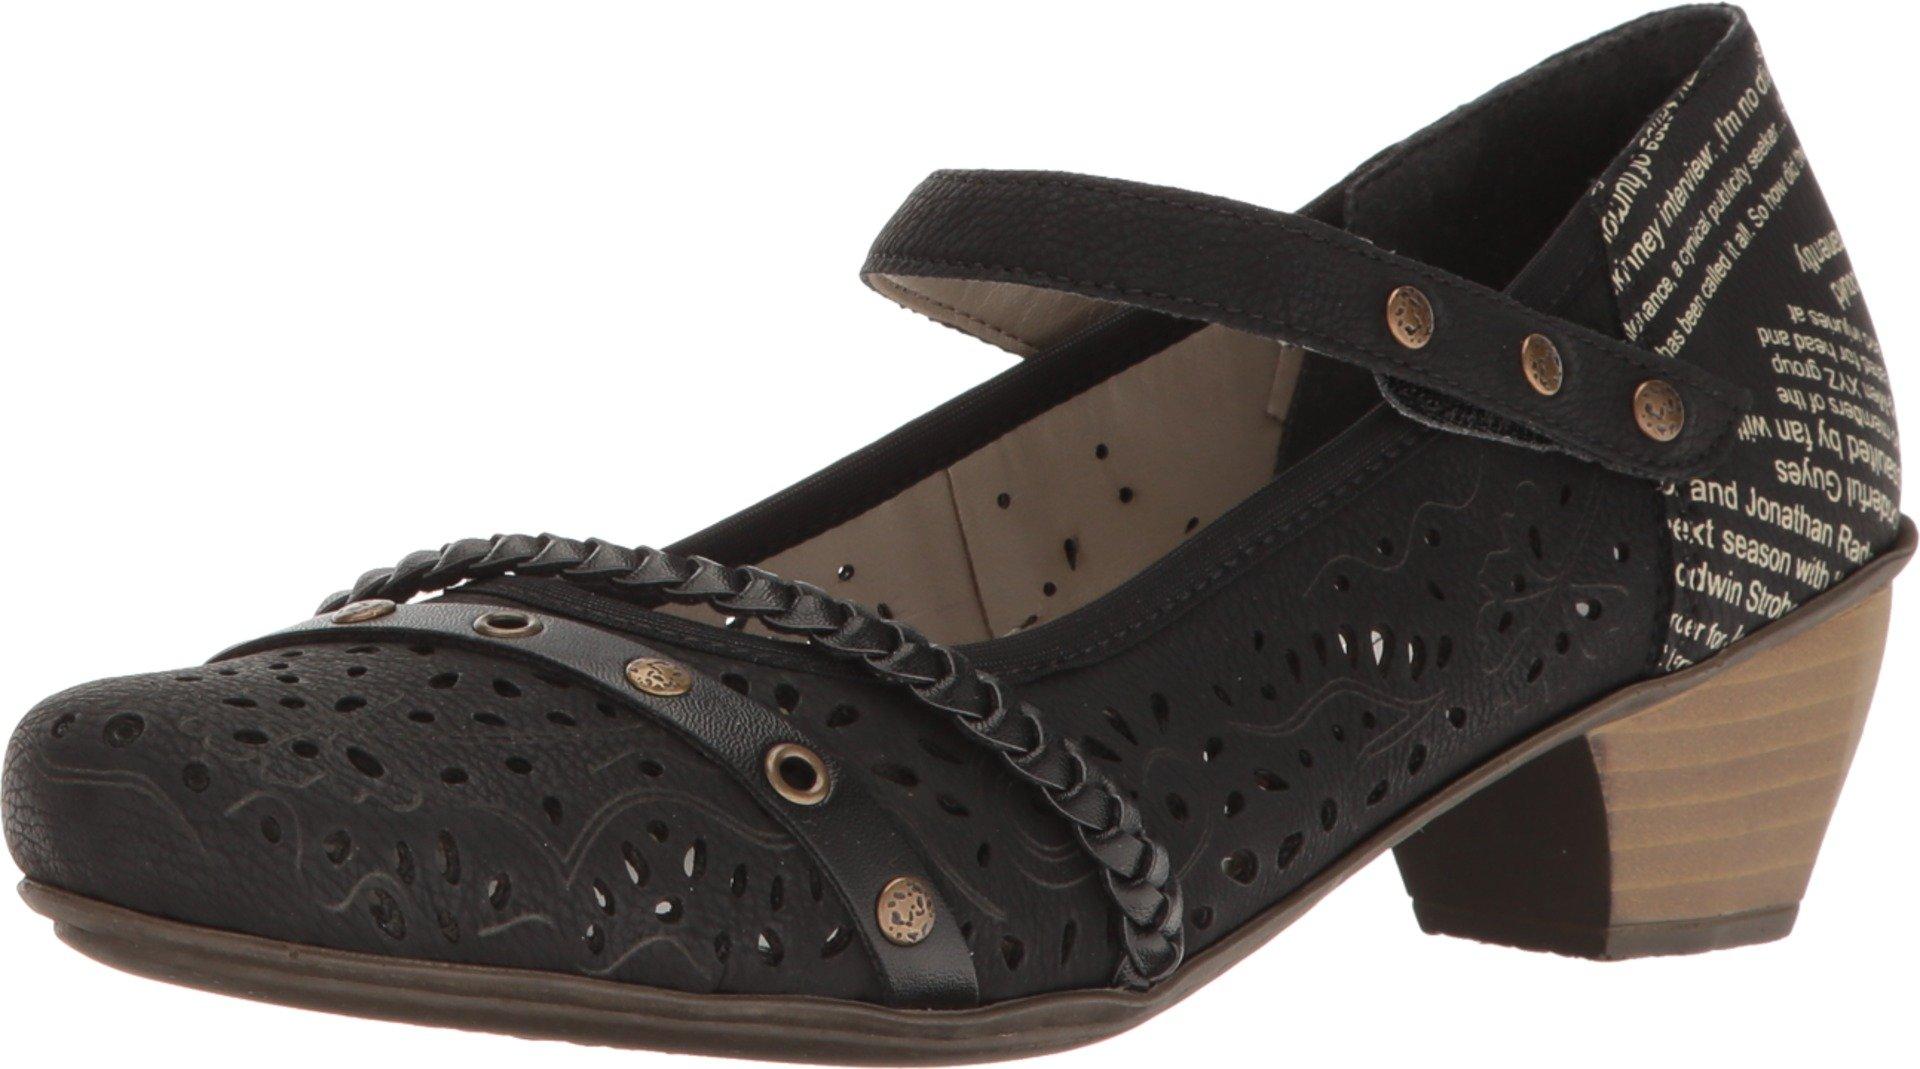 Rieker Women's 41756 Mariah 56 Black/Black/Mombasa/Fino Shoe